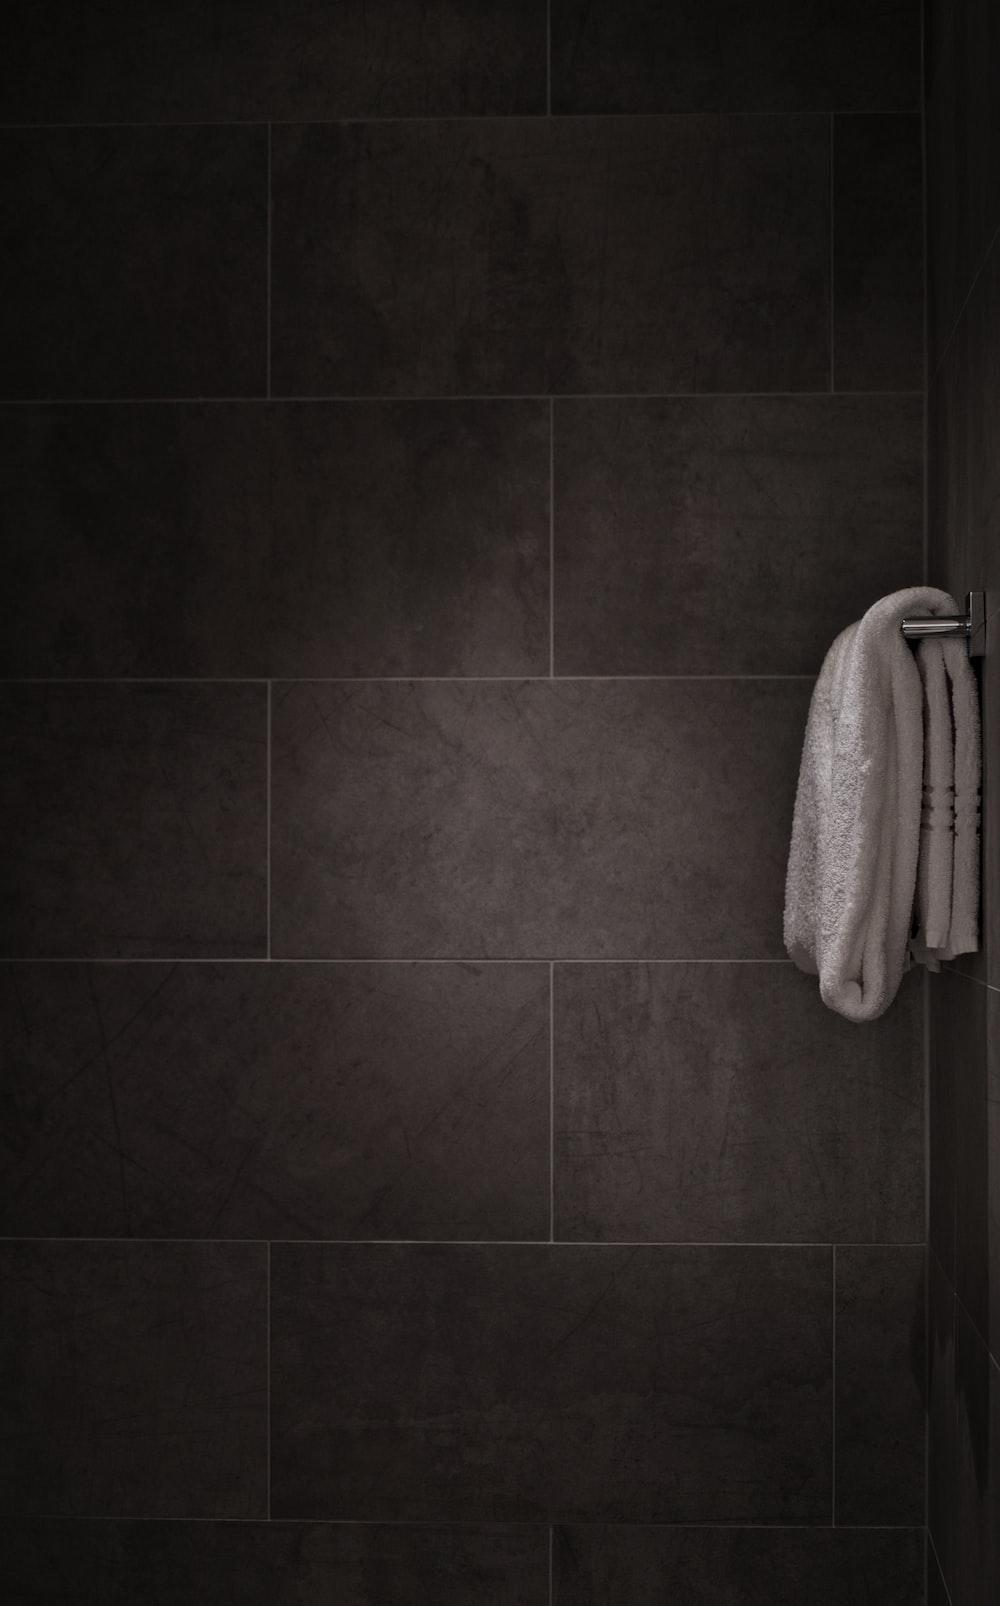 white bath towel hanged on bar